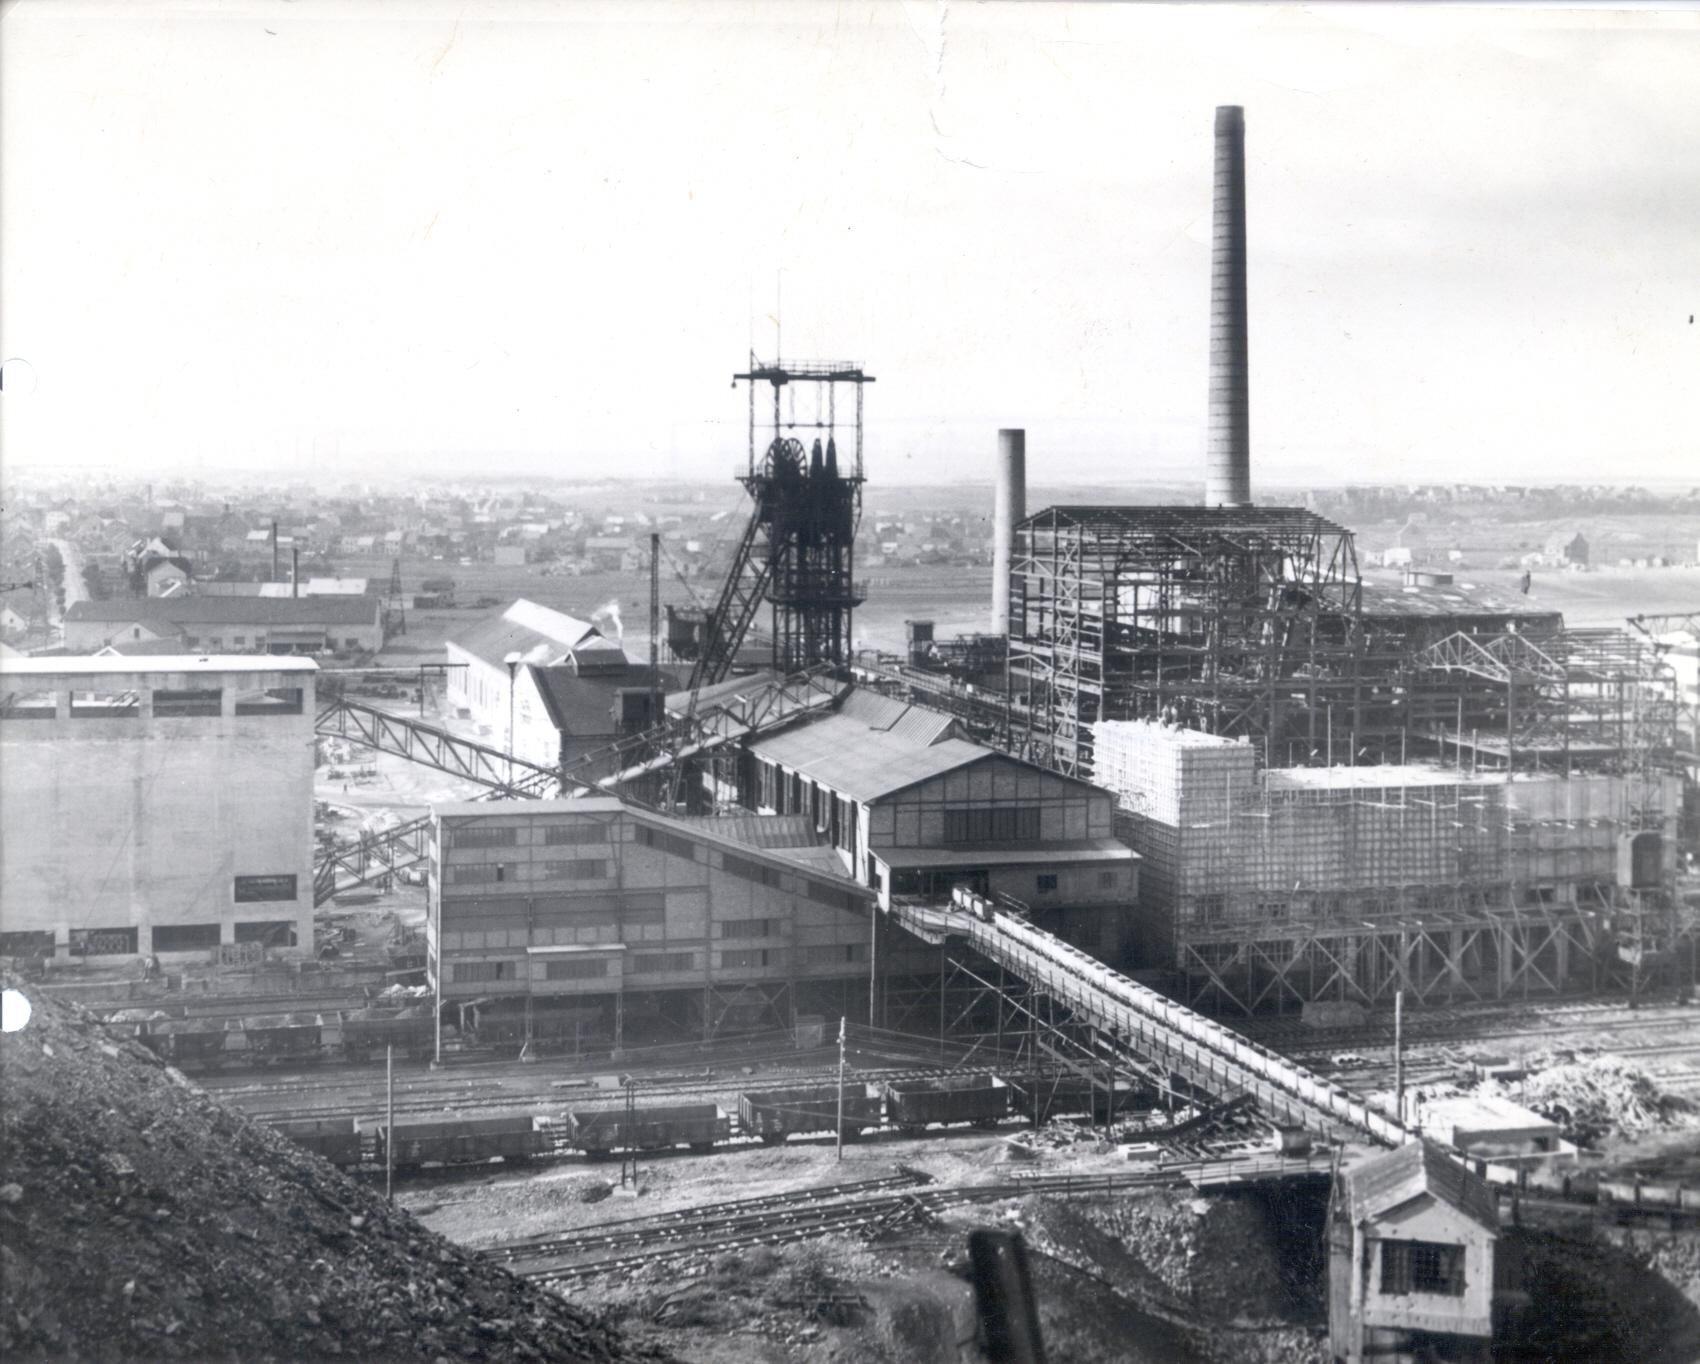 Bild zu Text Geschichte Saarschacht Wiederaufbau 1949